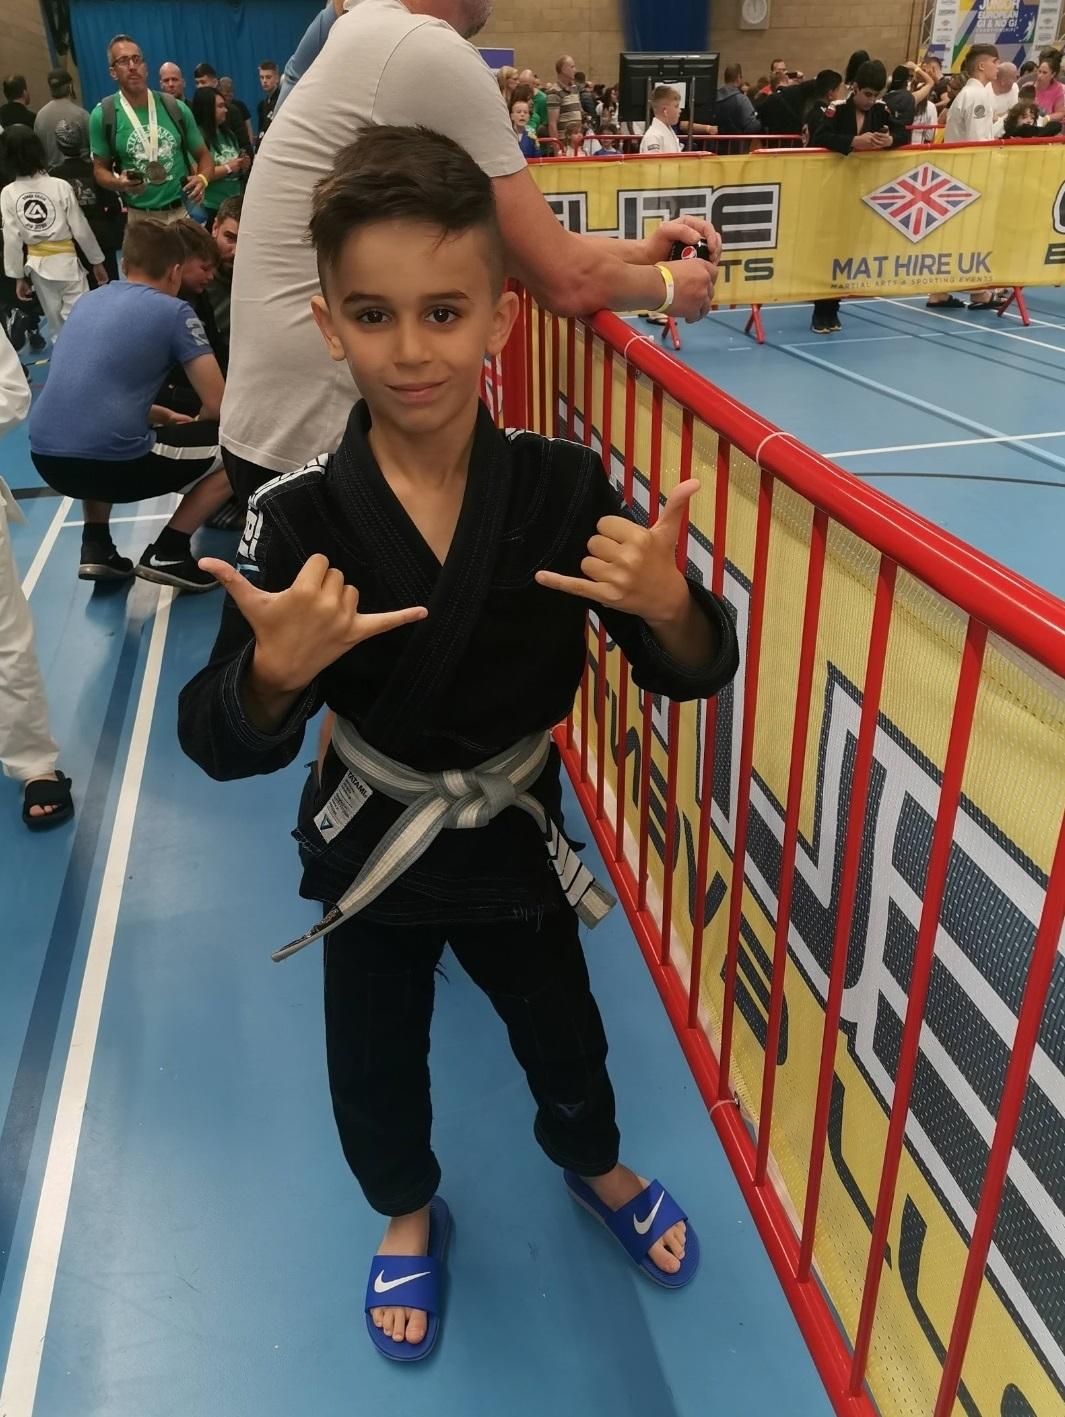 2019 Pan Kids International Brazilian Jiu-Jitsu Championship: Junior martial arts world champion, 8, 'desperate' to fight state-side